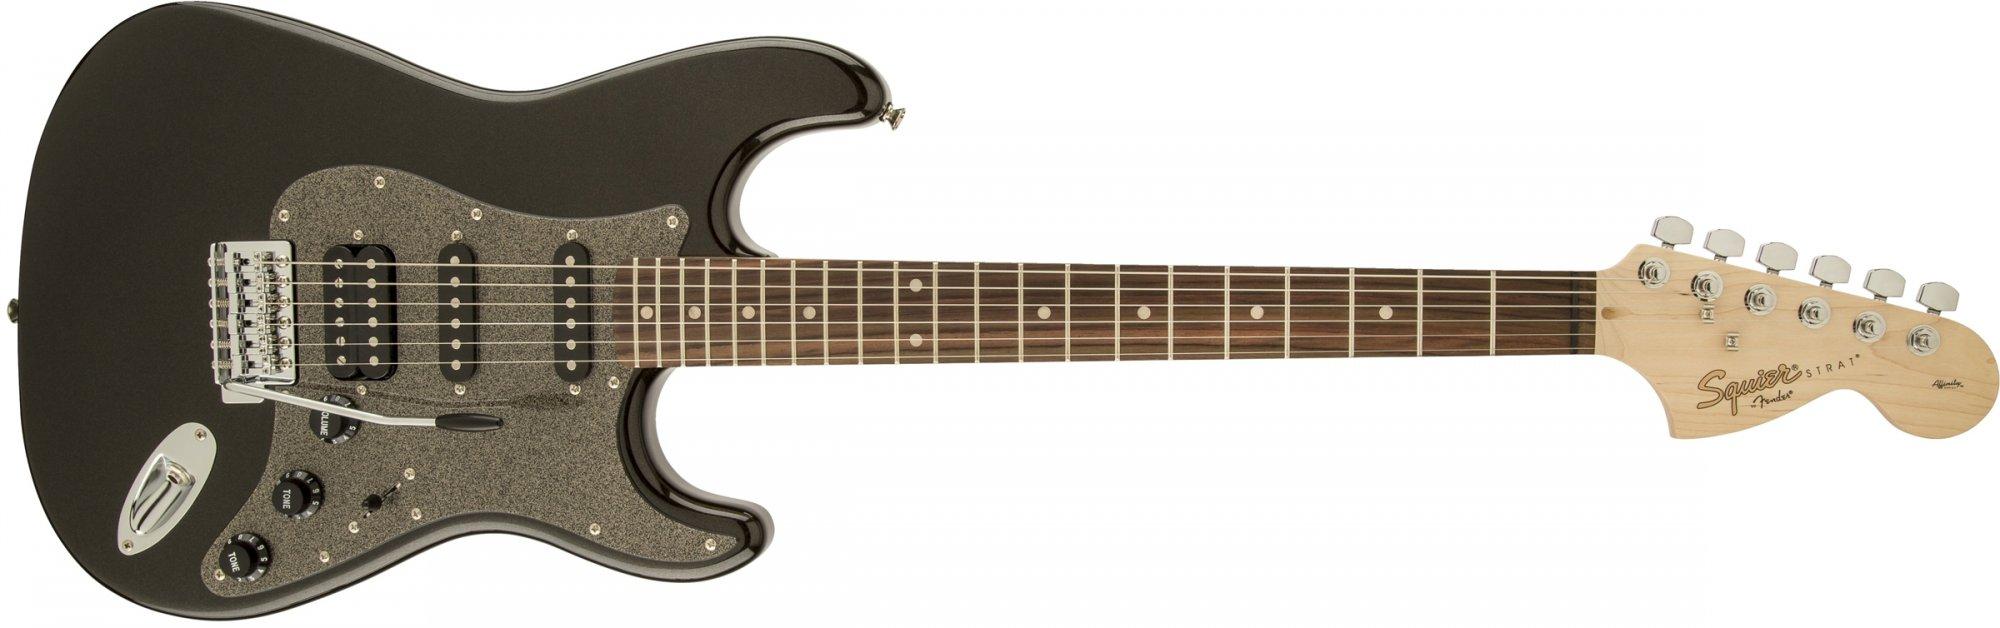 Fender Squier Affinity Stratocaster HSS Montego Black Metallic